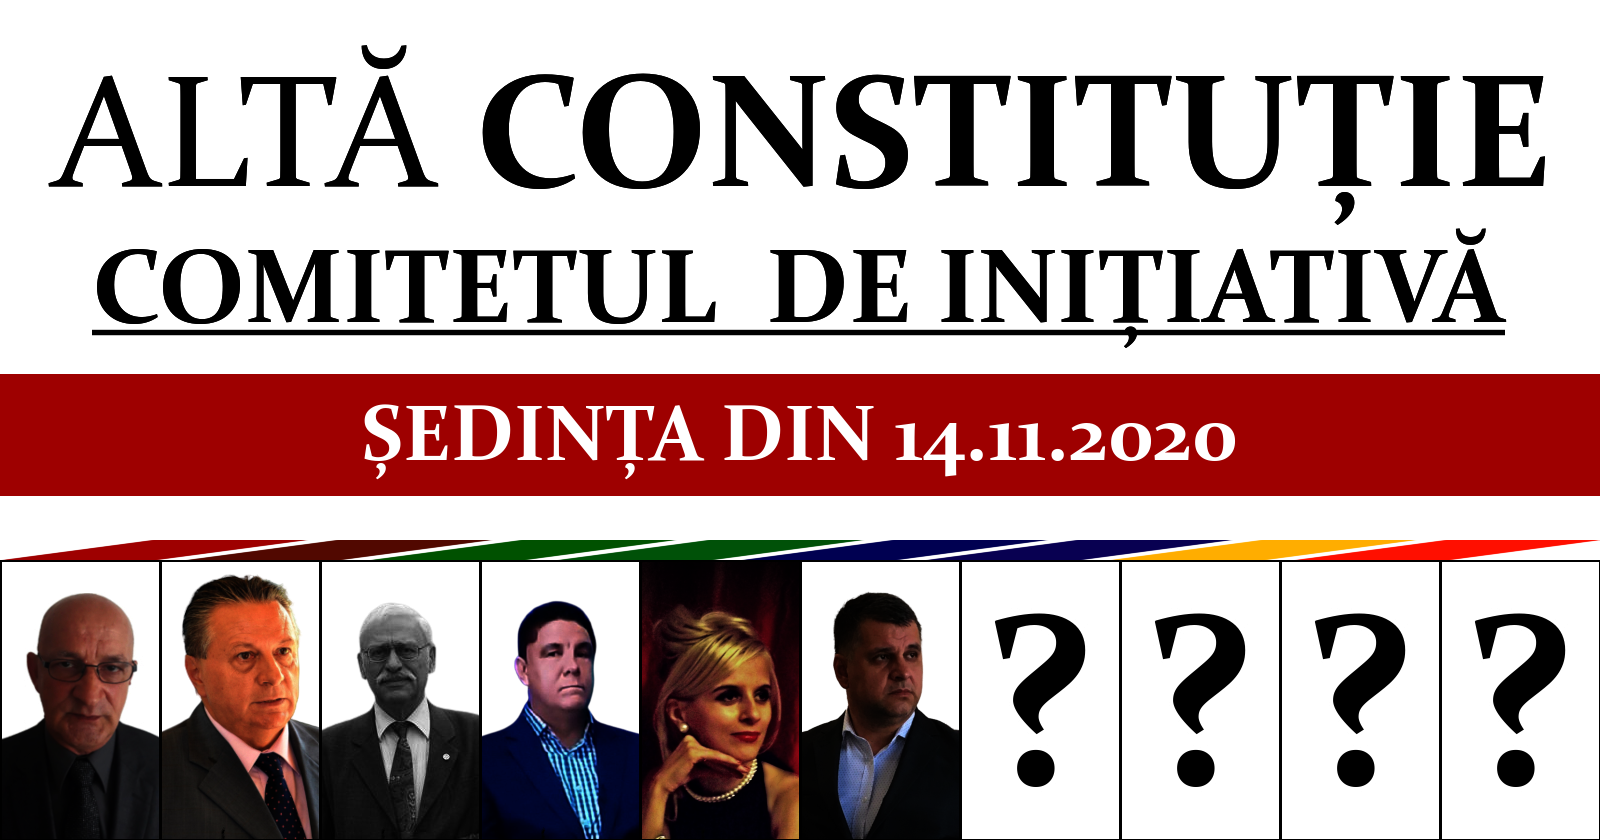 https://ziarul.romania-rationala.ro/control/articole/articole/2020-11-14-comitet-initiativa-alta-constitutie.png